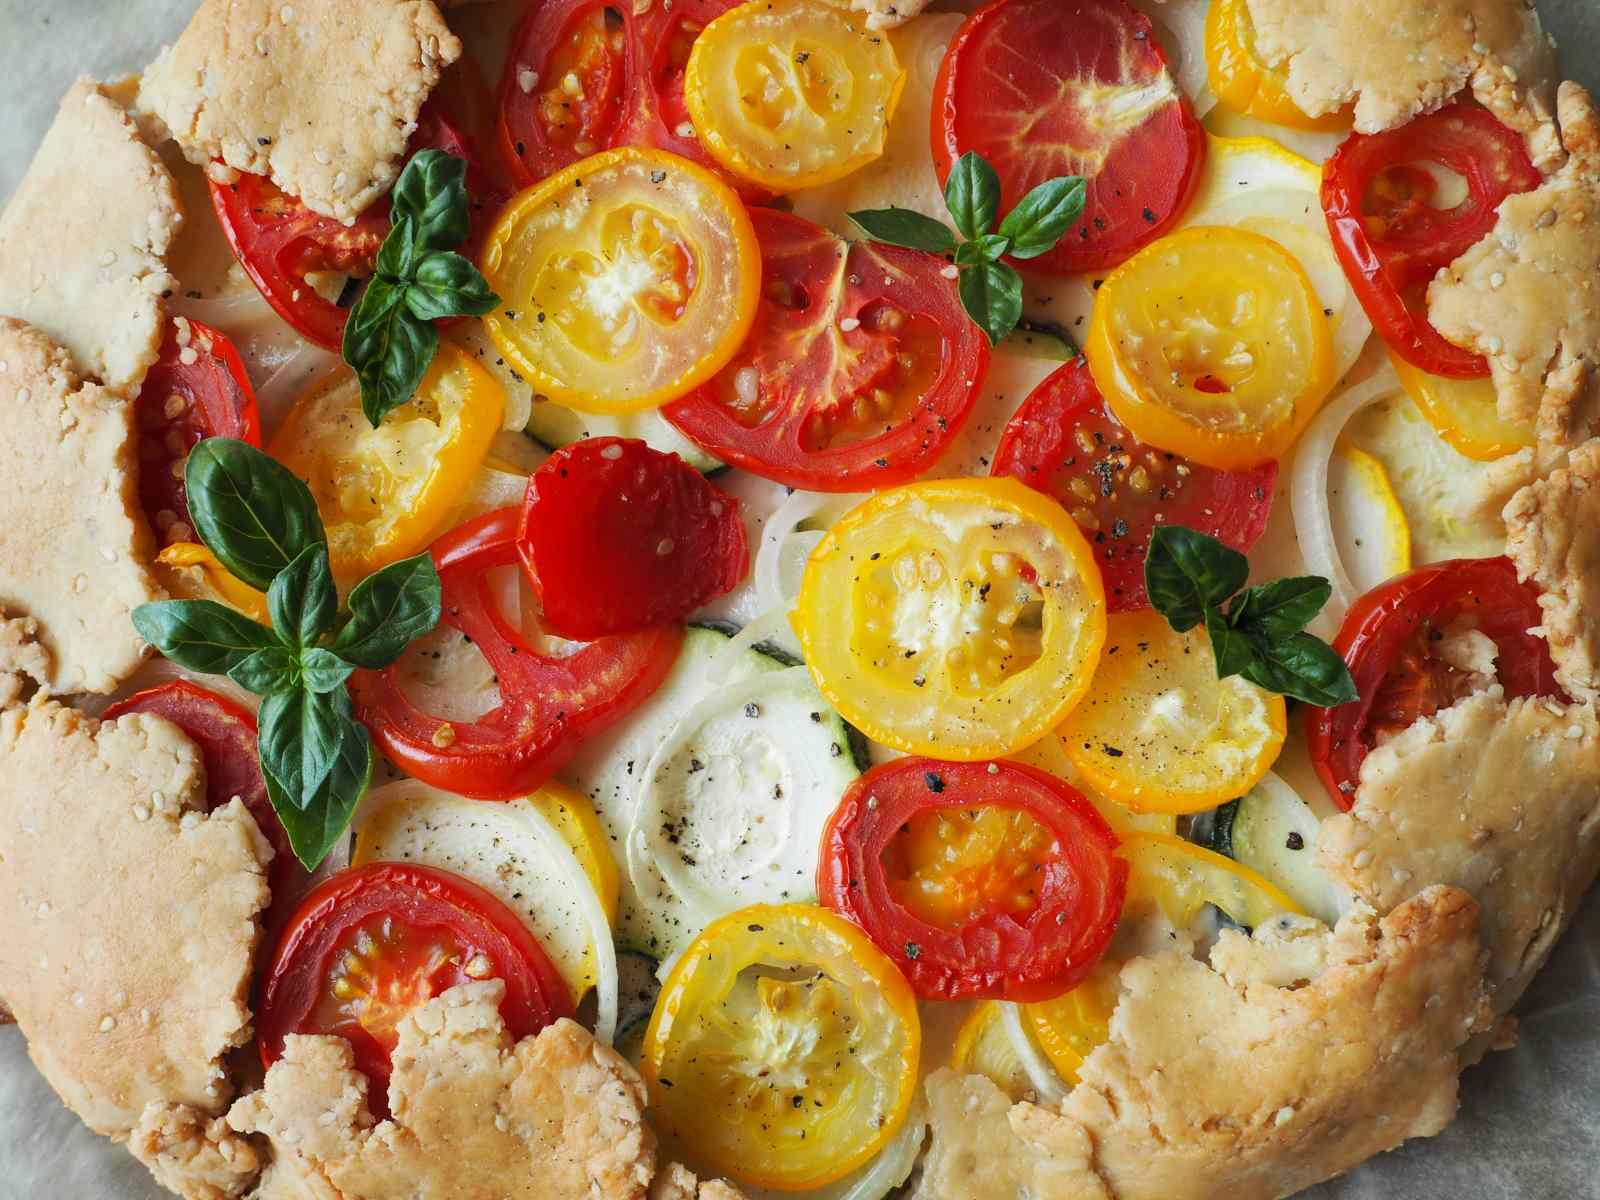 Nahaufnahme Tomaten-Zucchini-Galette